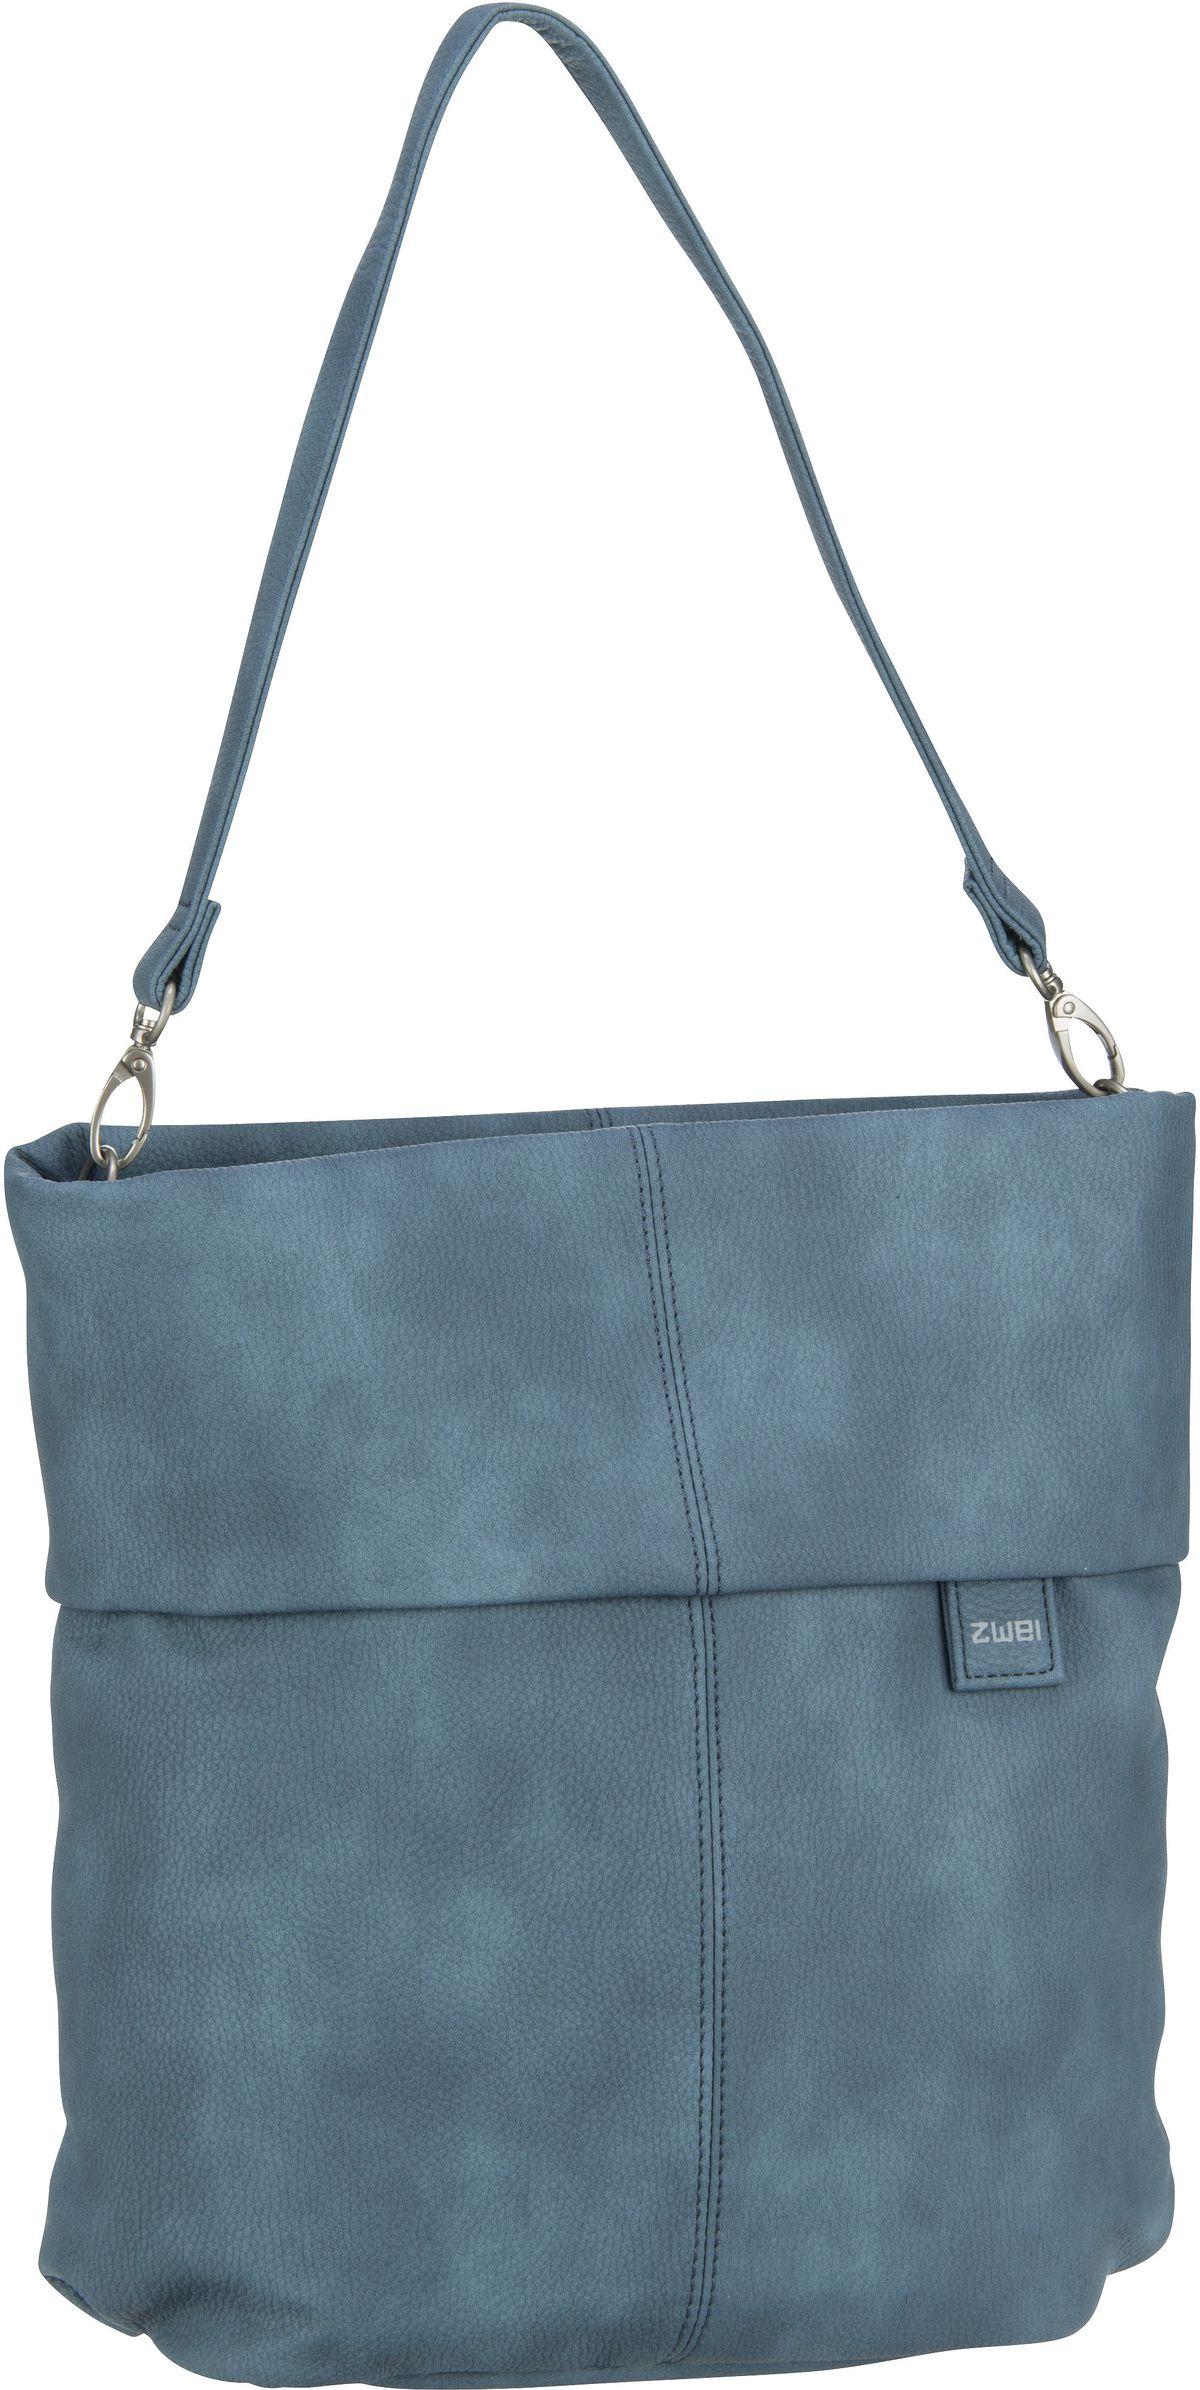 Handtasche Mademoiselle M12 Nubuk/Sea (7 Liter)